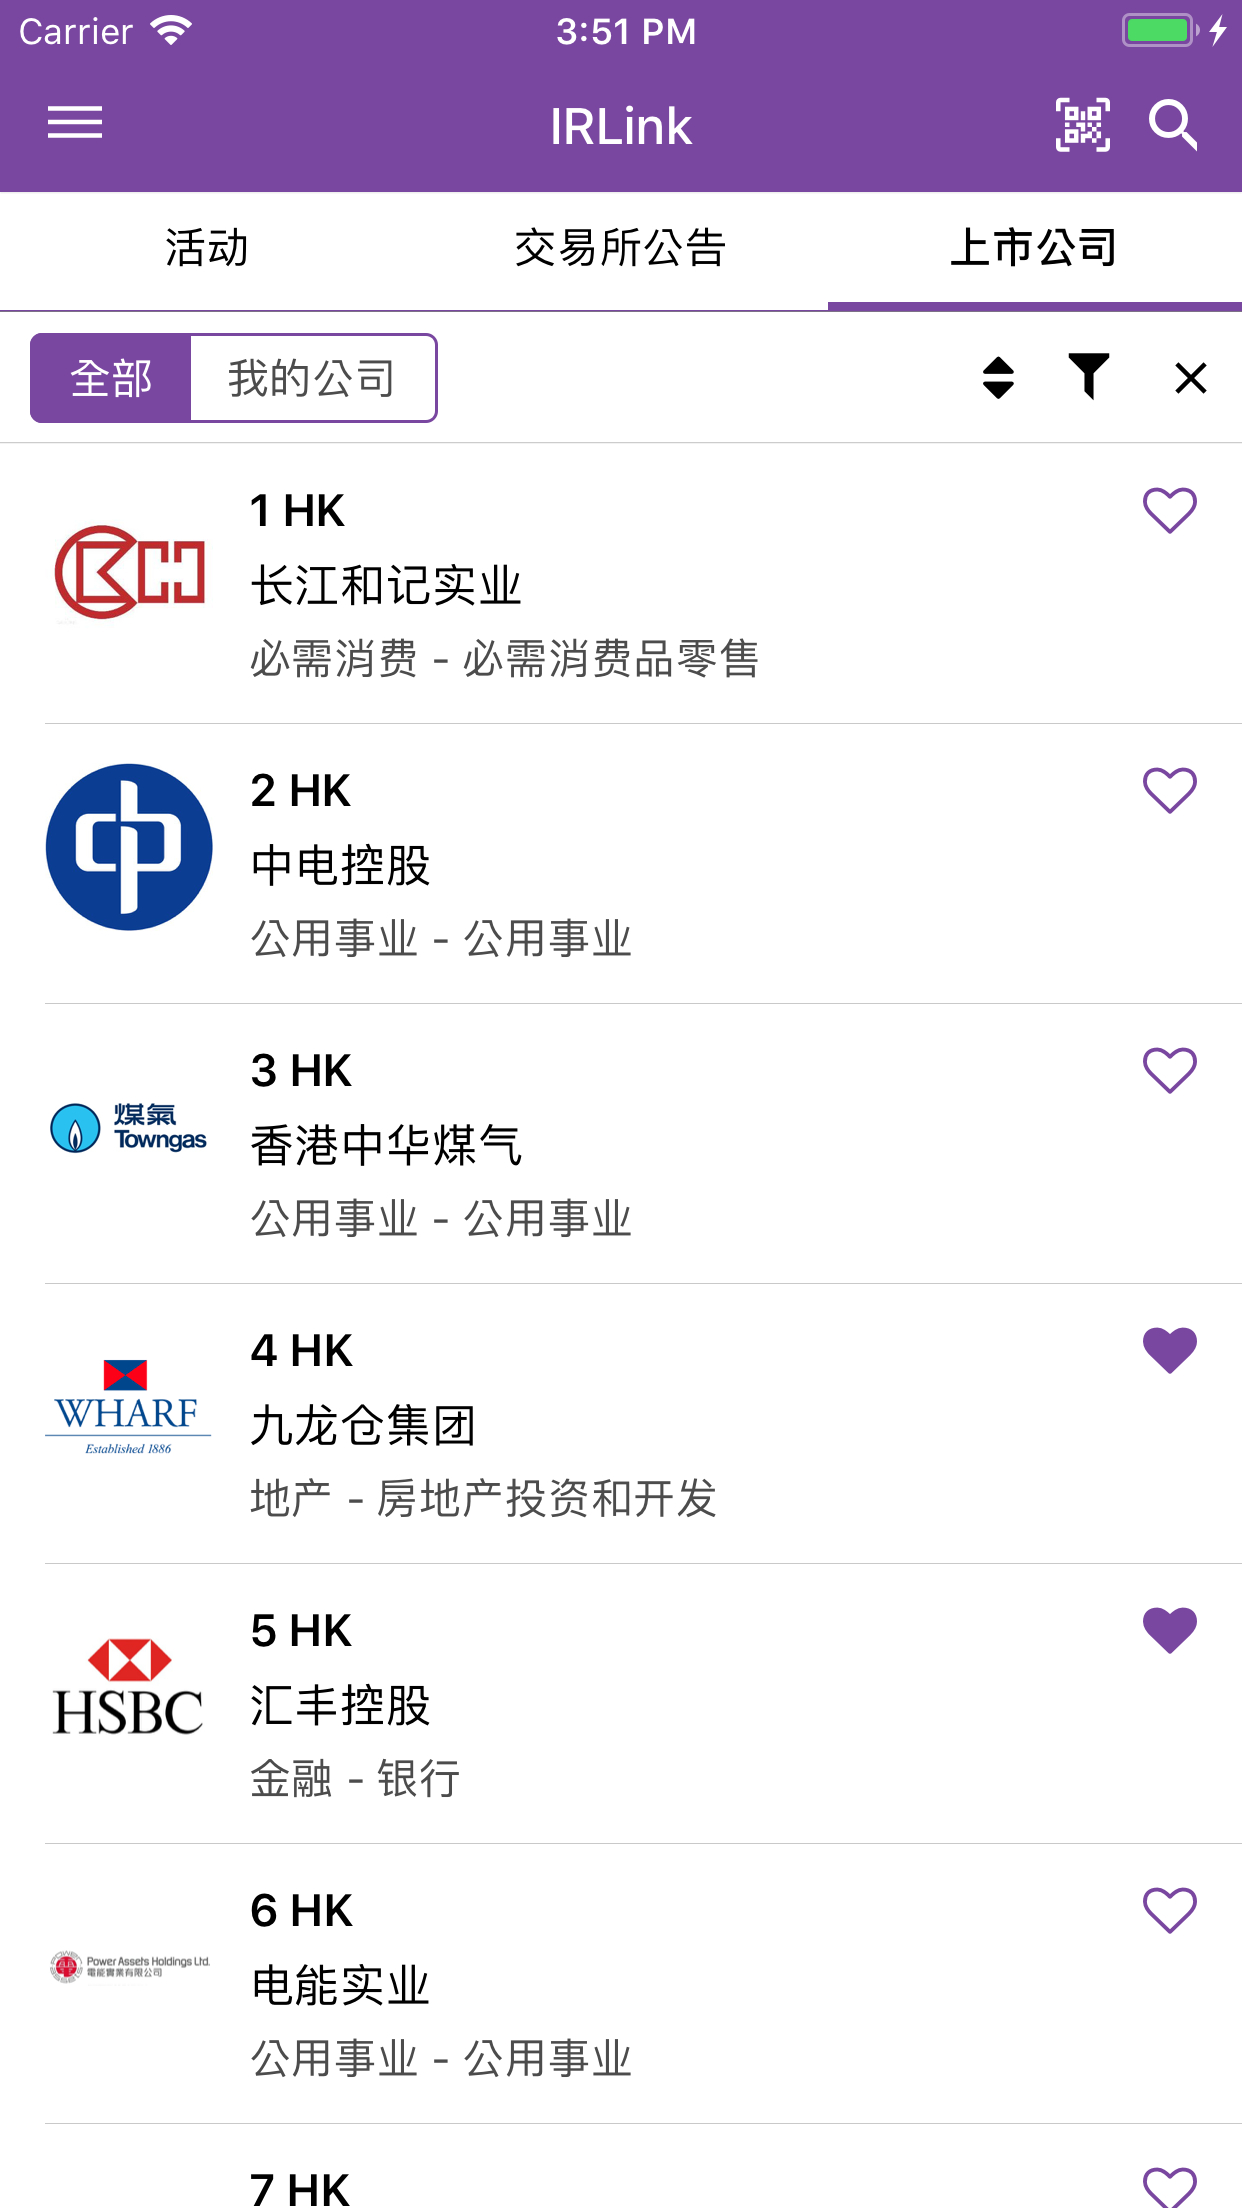 IRLink 投关汇-应用截图